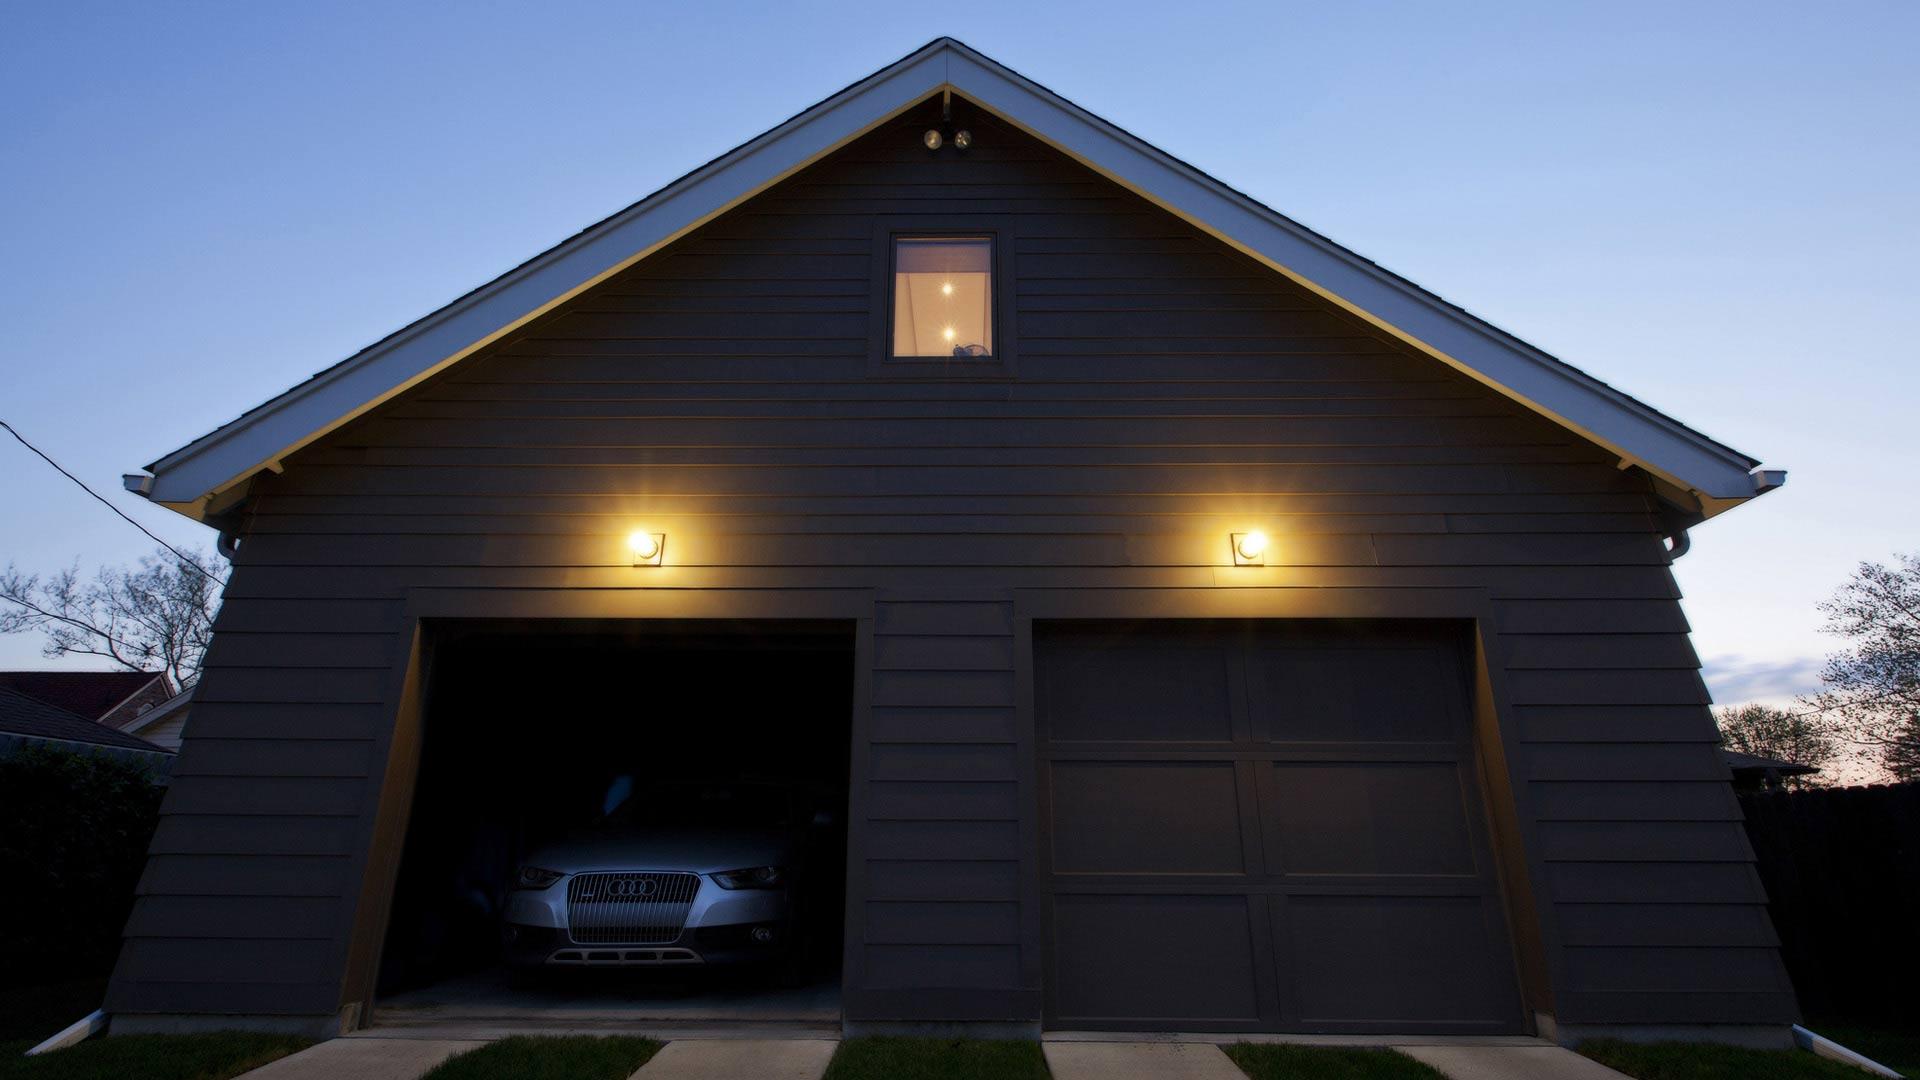 Classic Irvington Tudor Remodel - Detached Garage Studio - Christopher Short, Architect, Indianapolis, HAUS Architecture